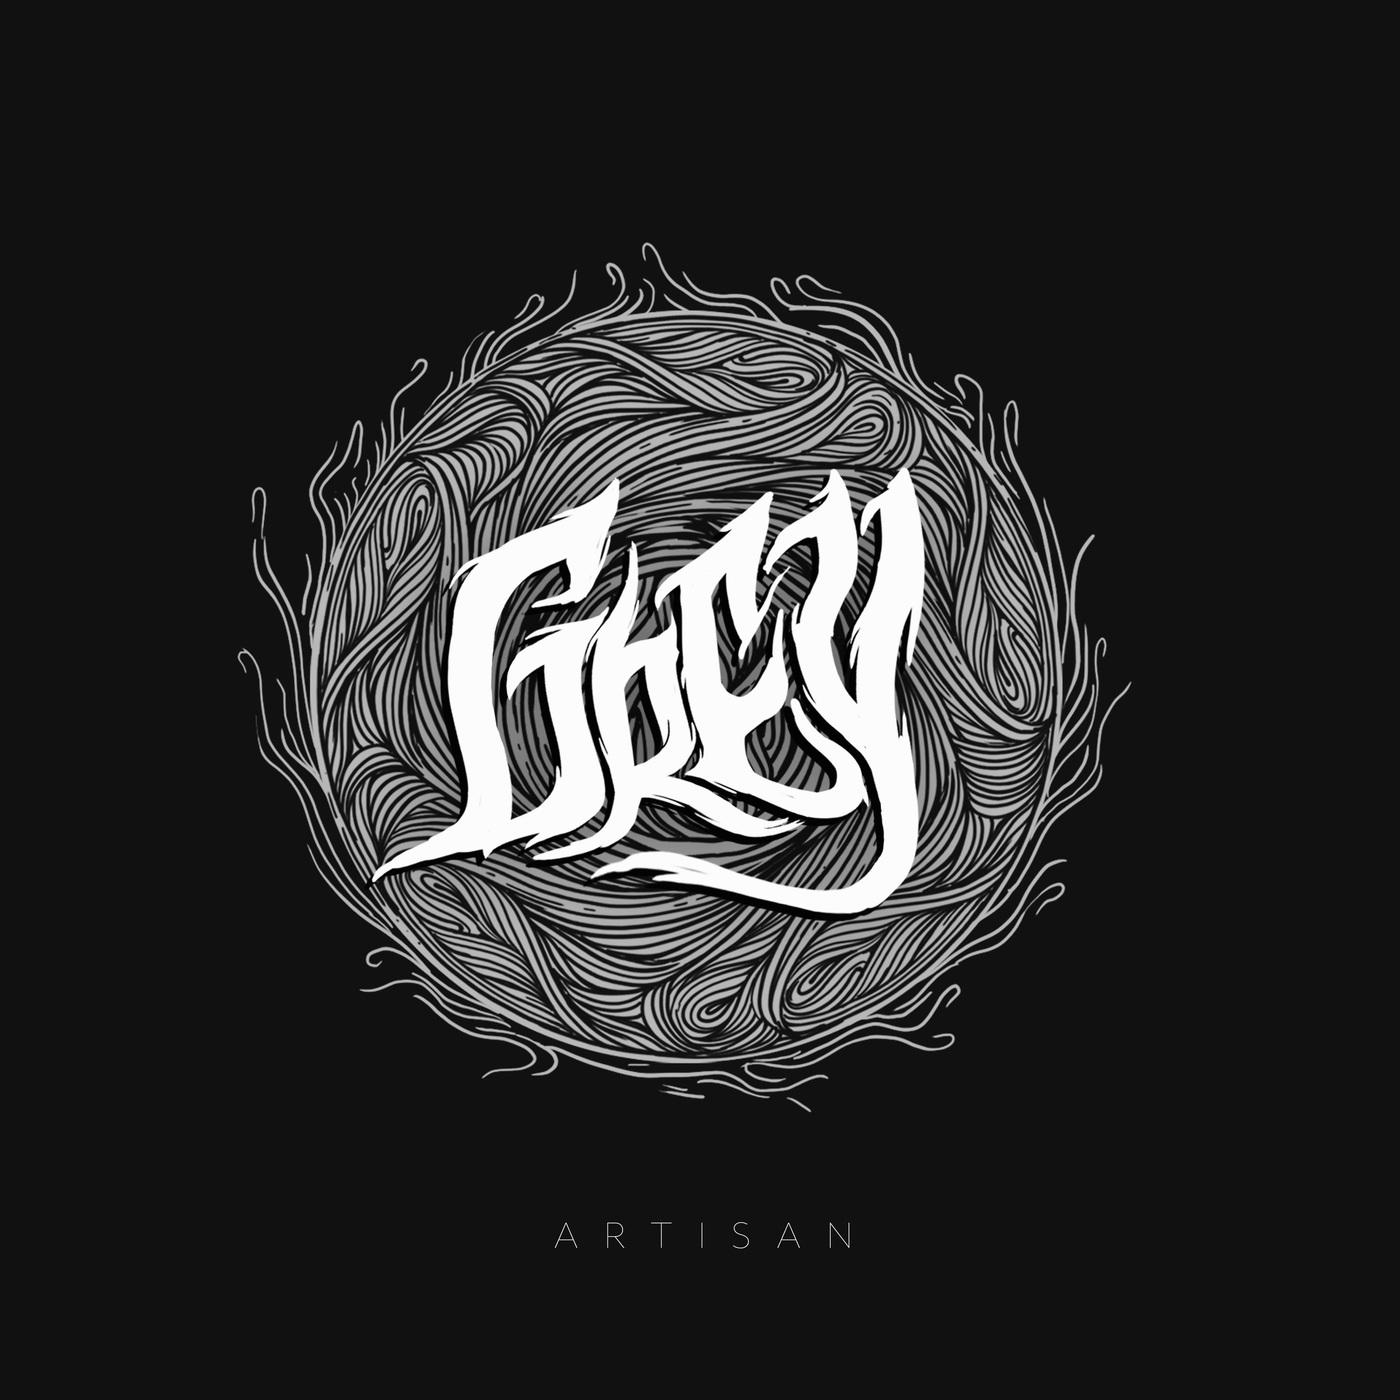 Artisan - Grey [EP] (2020)